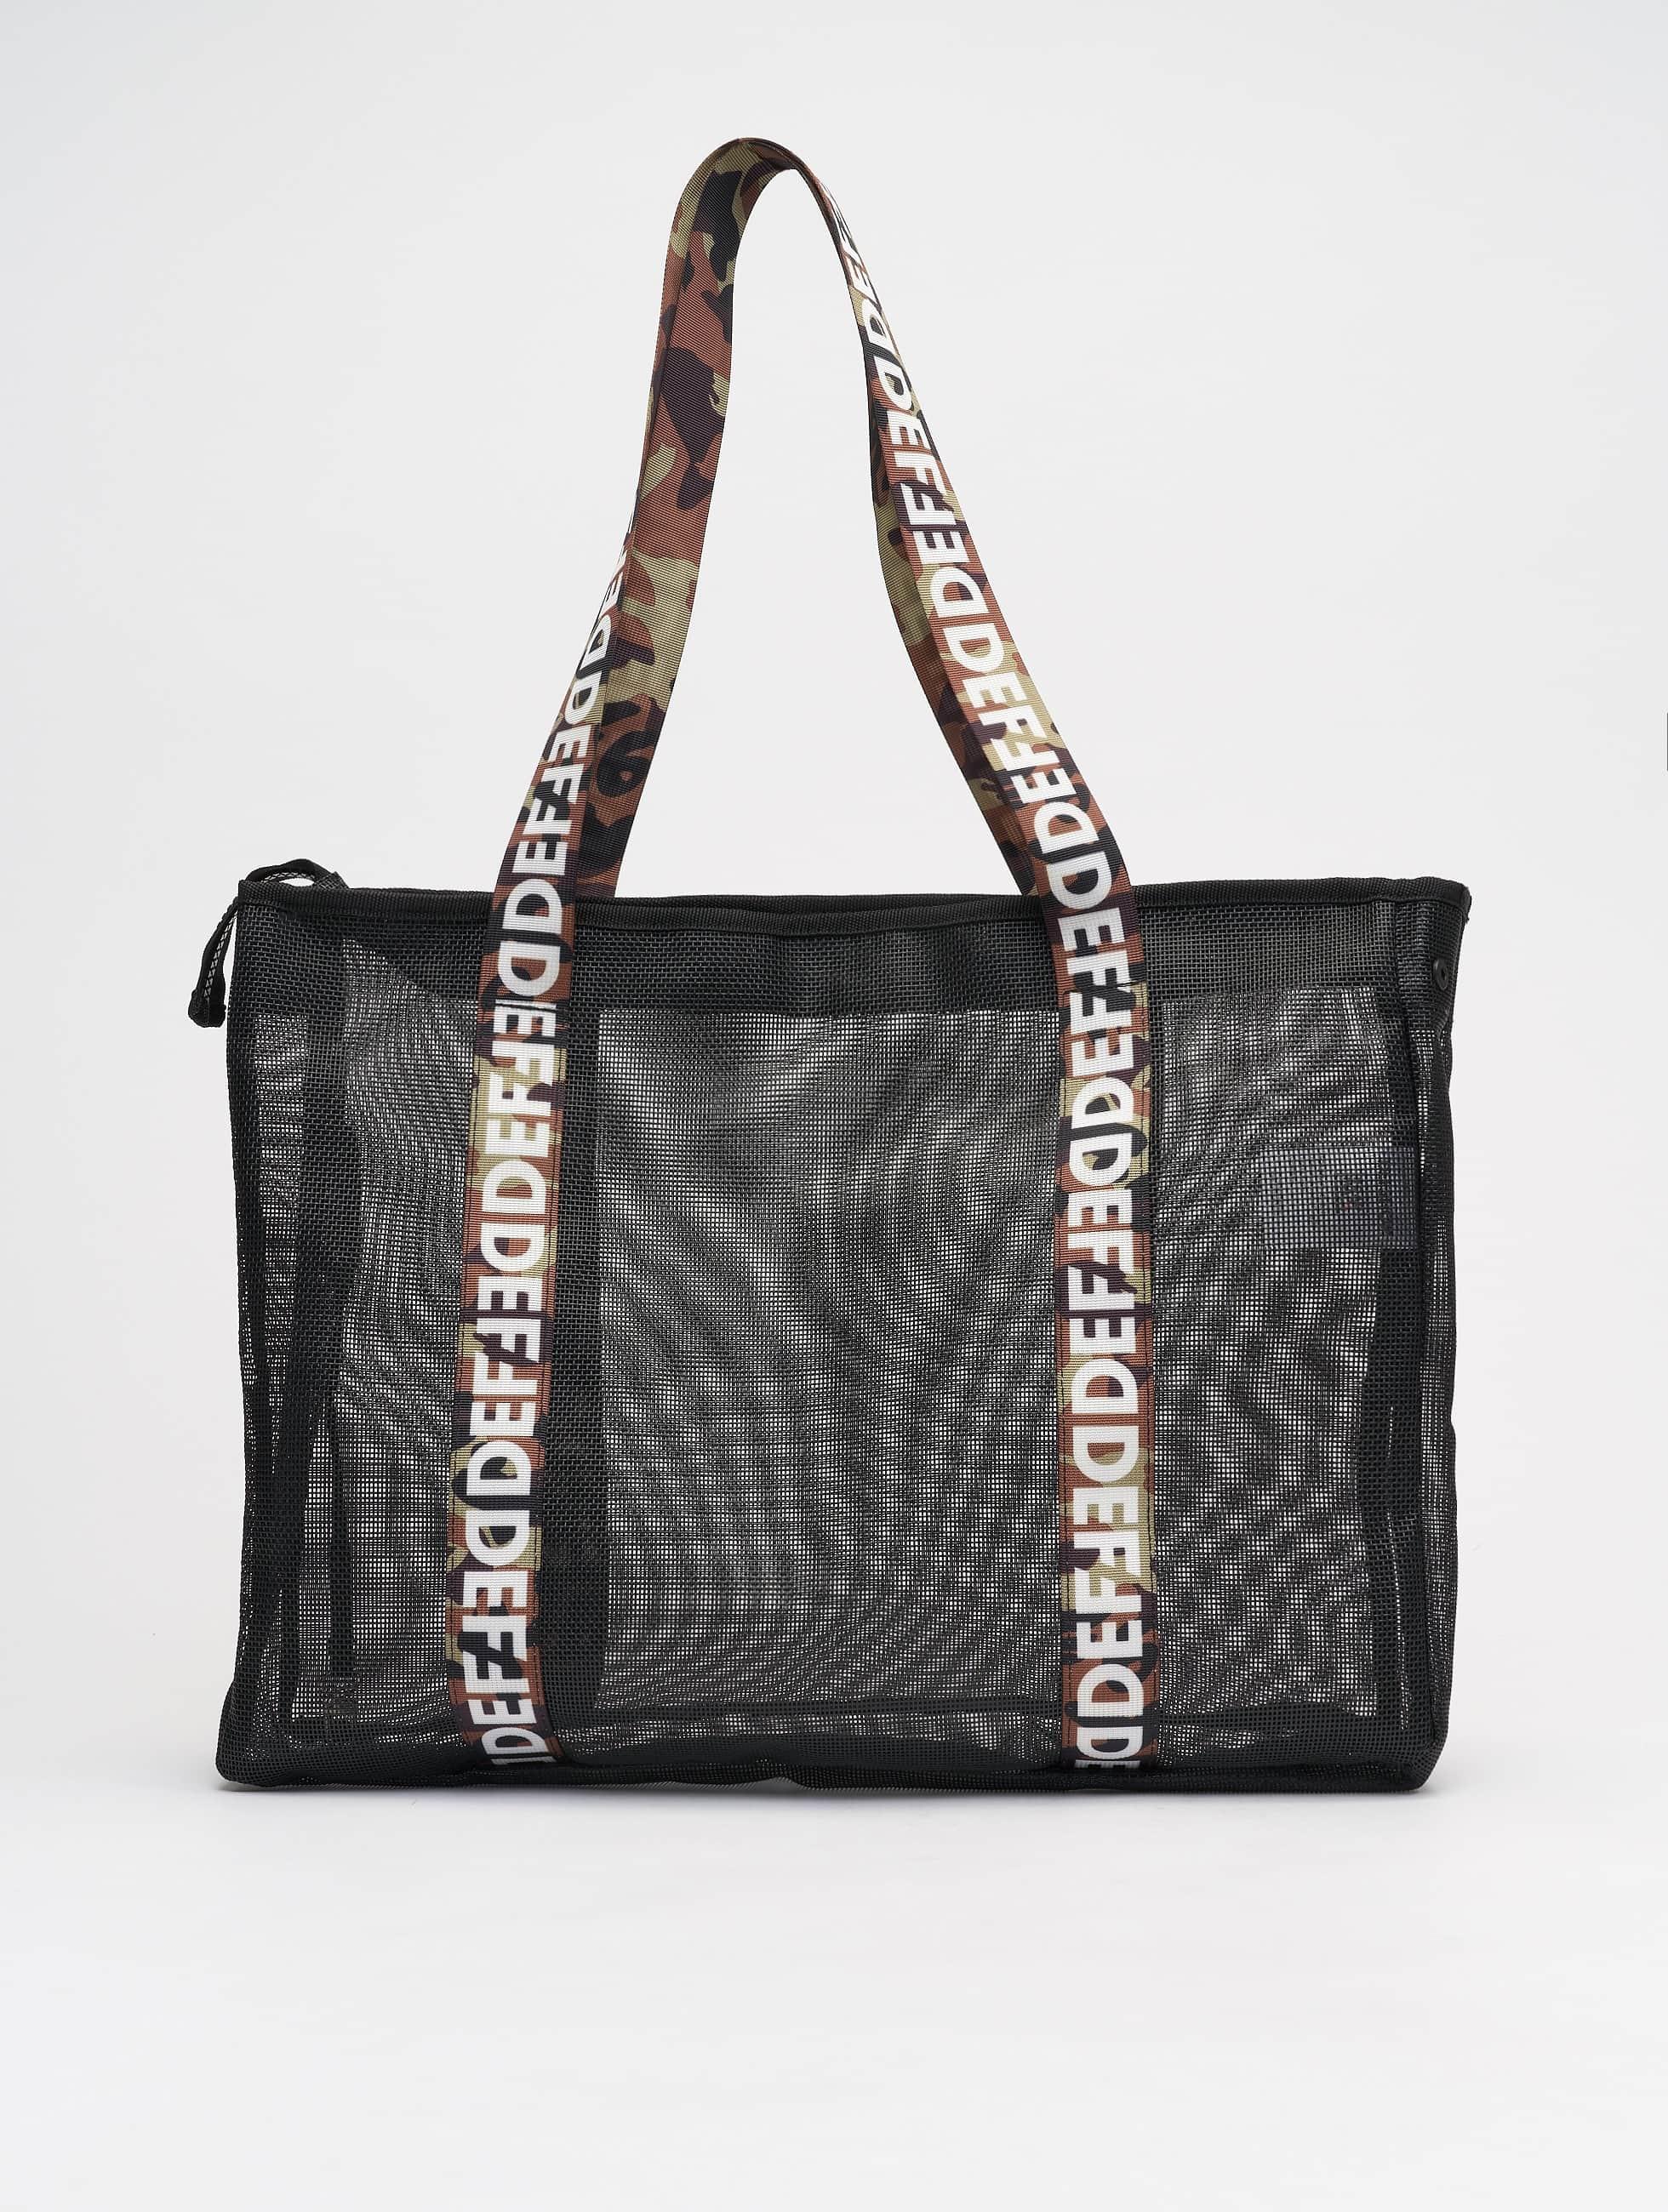 9393aebd0b DEF | Shopper noir Femme Sac 580833